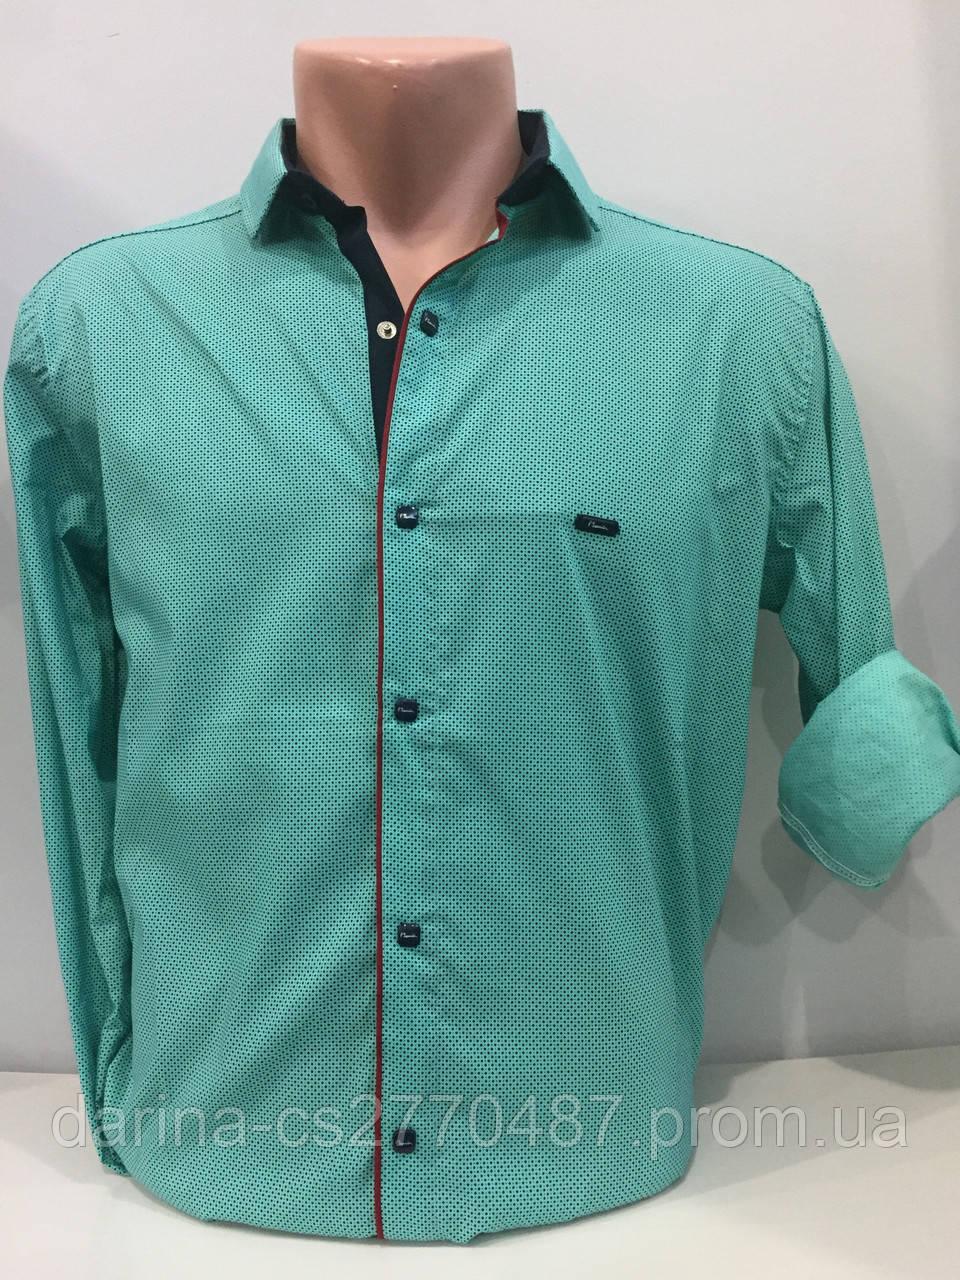 Мужская рубашка на кнопках M,L